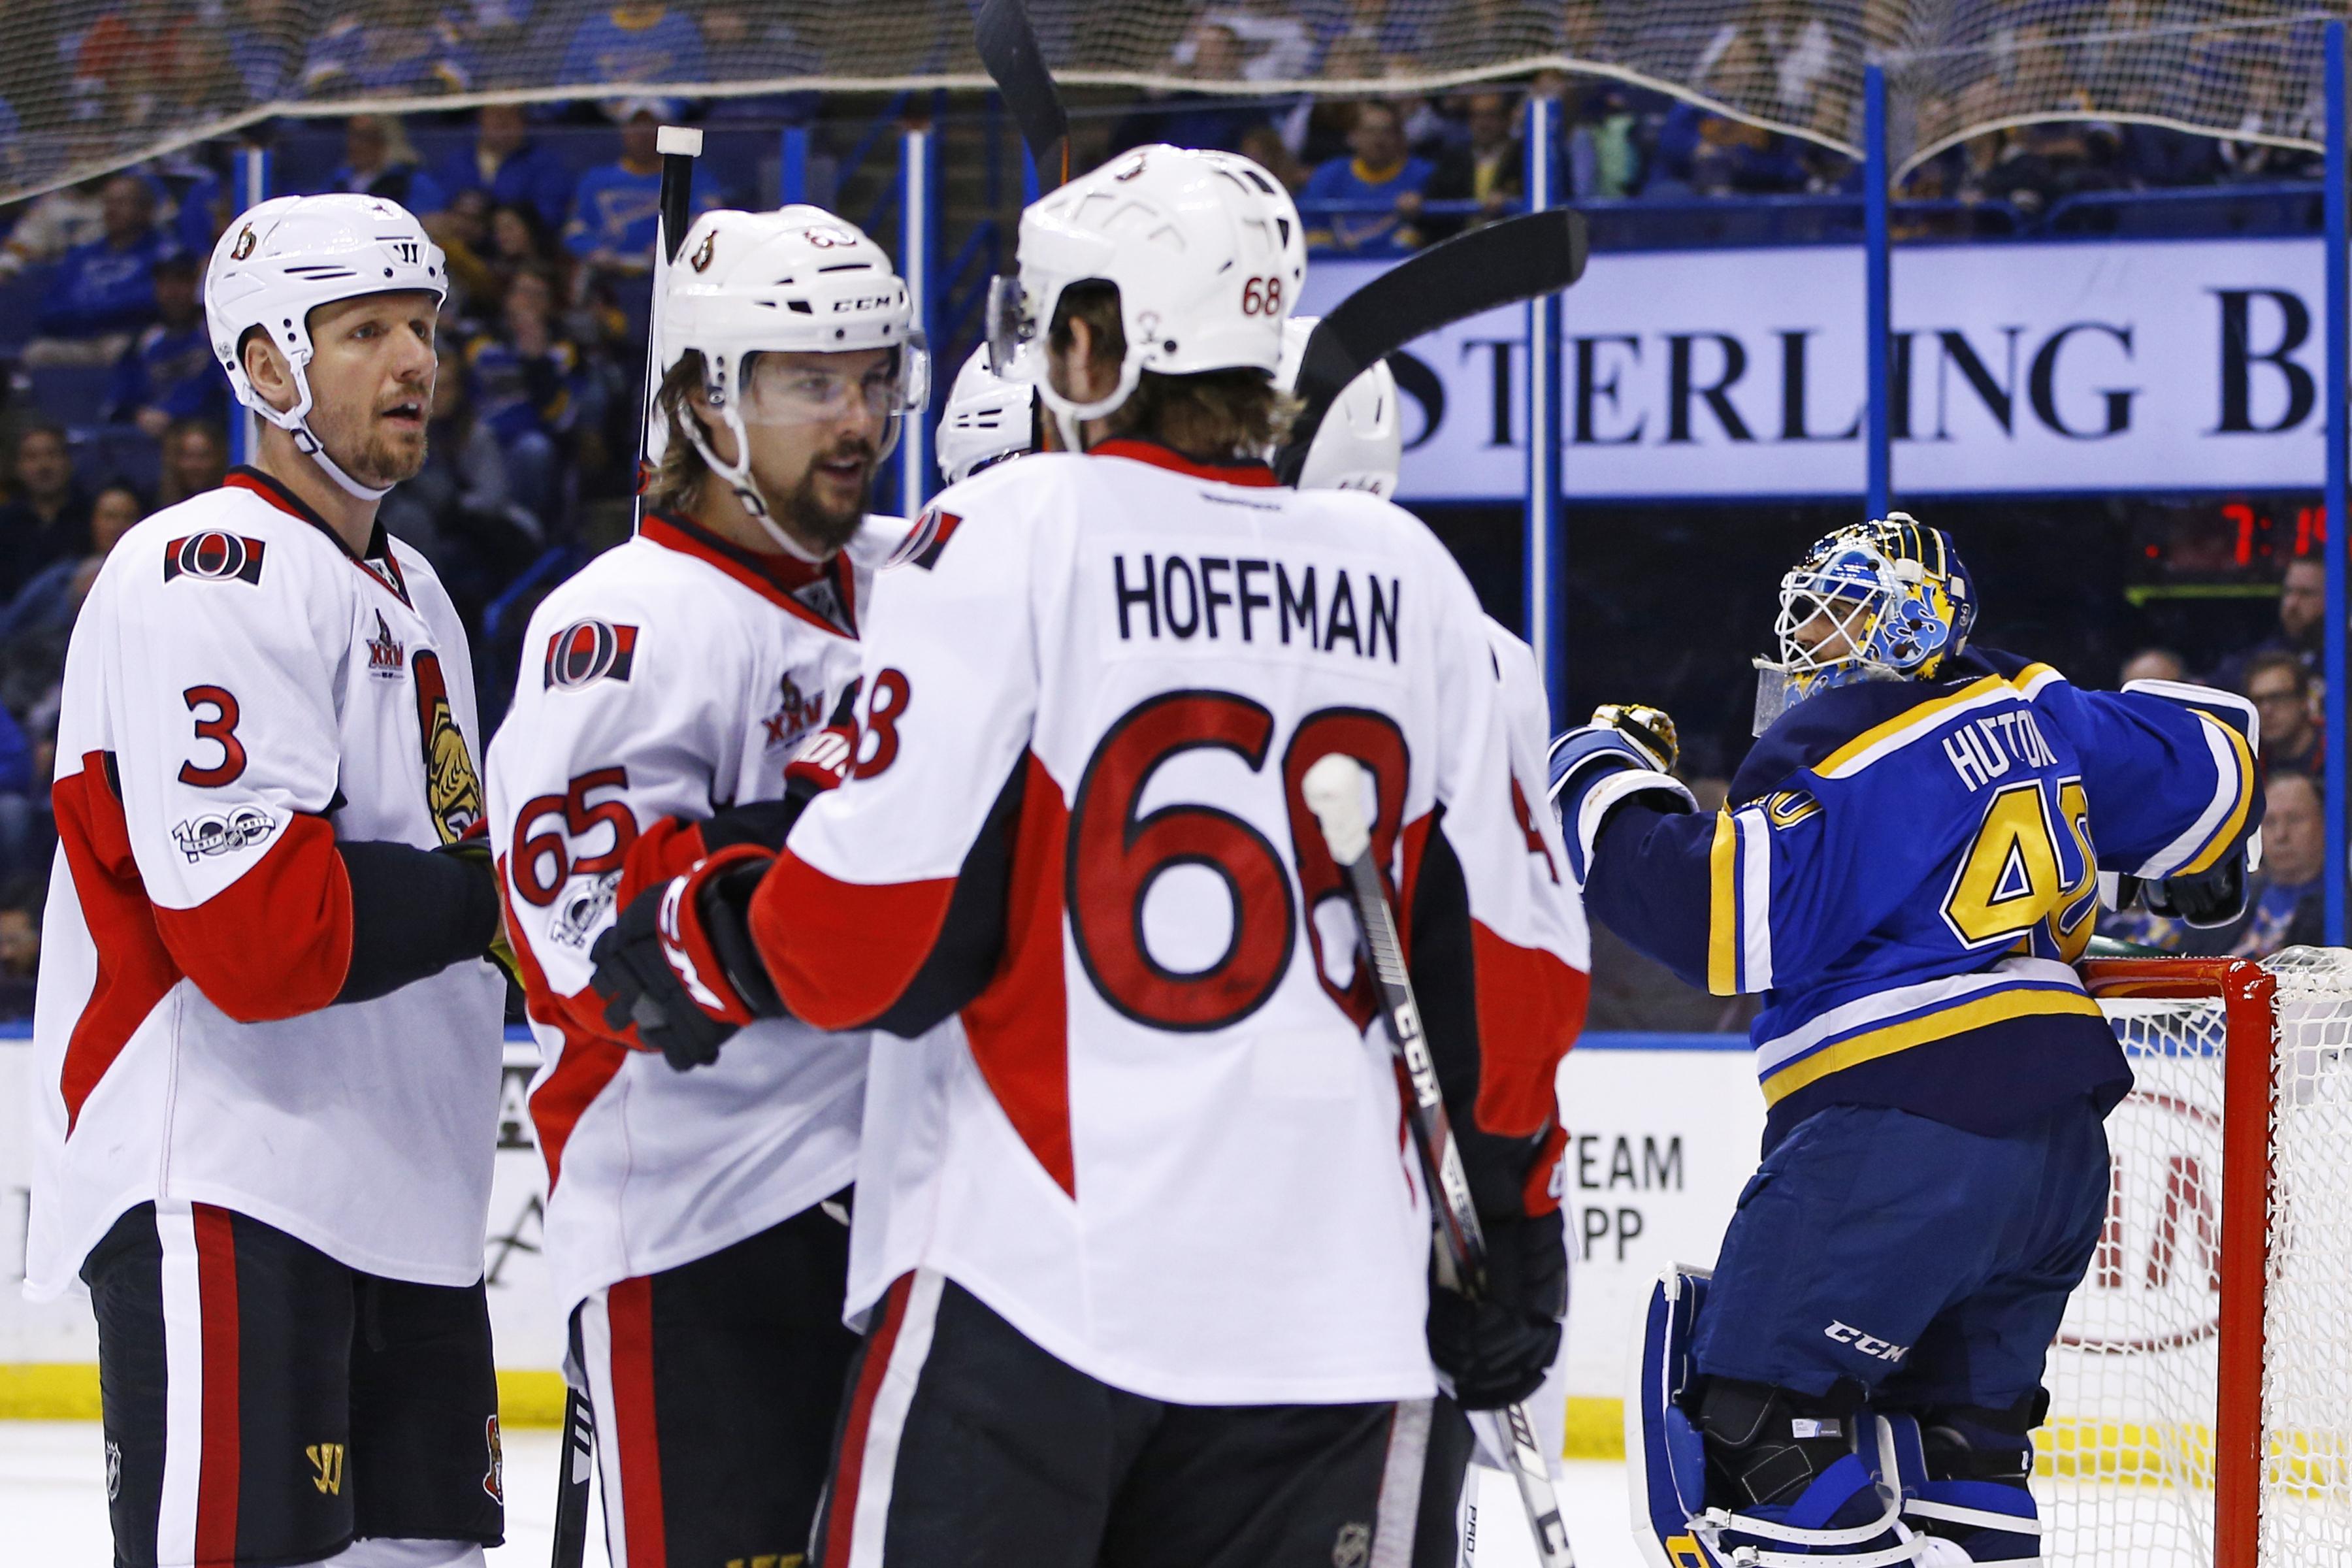 Senators_blues_hockey_53632